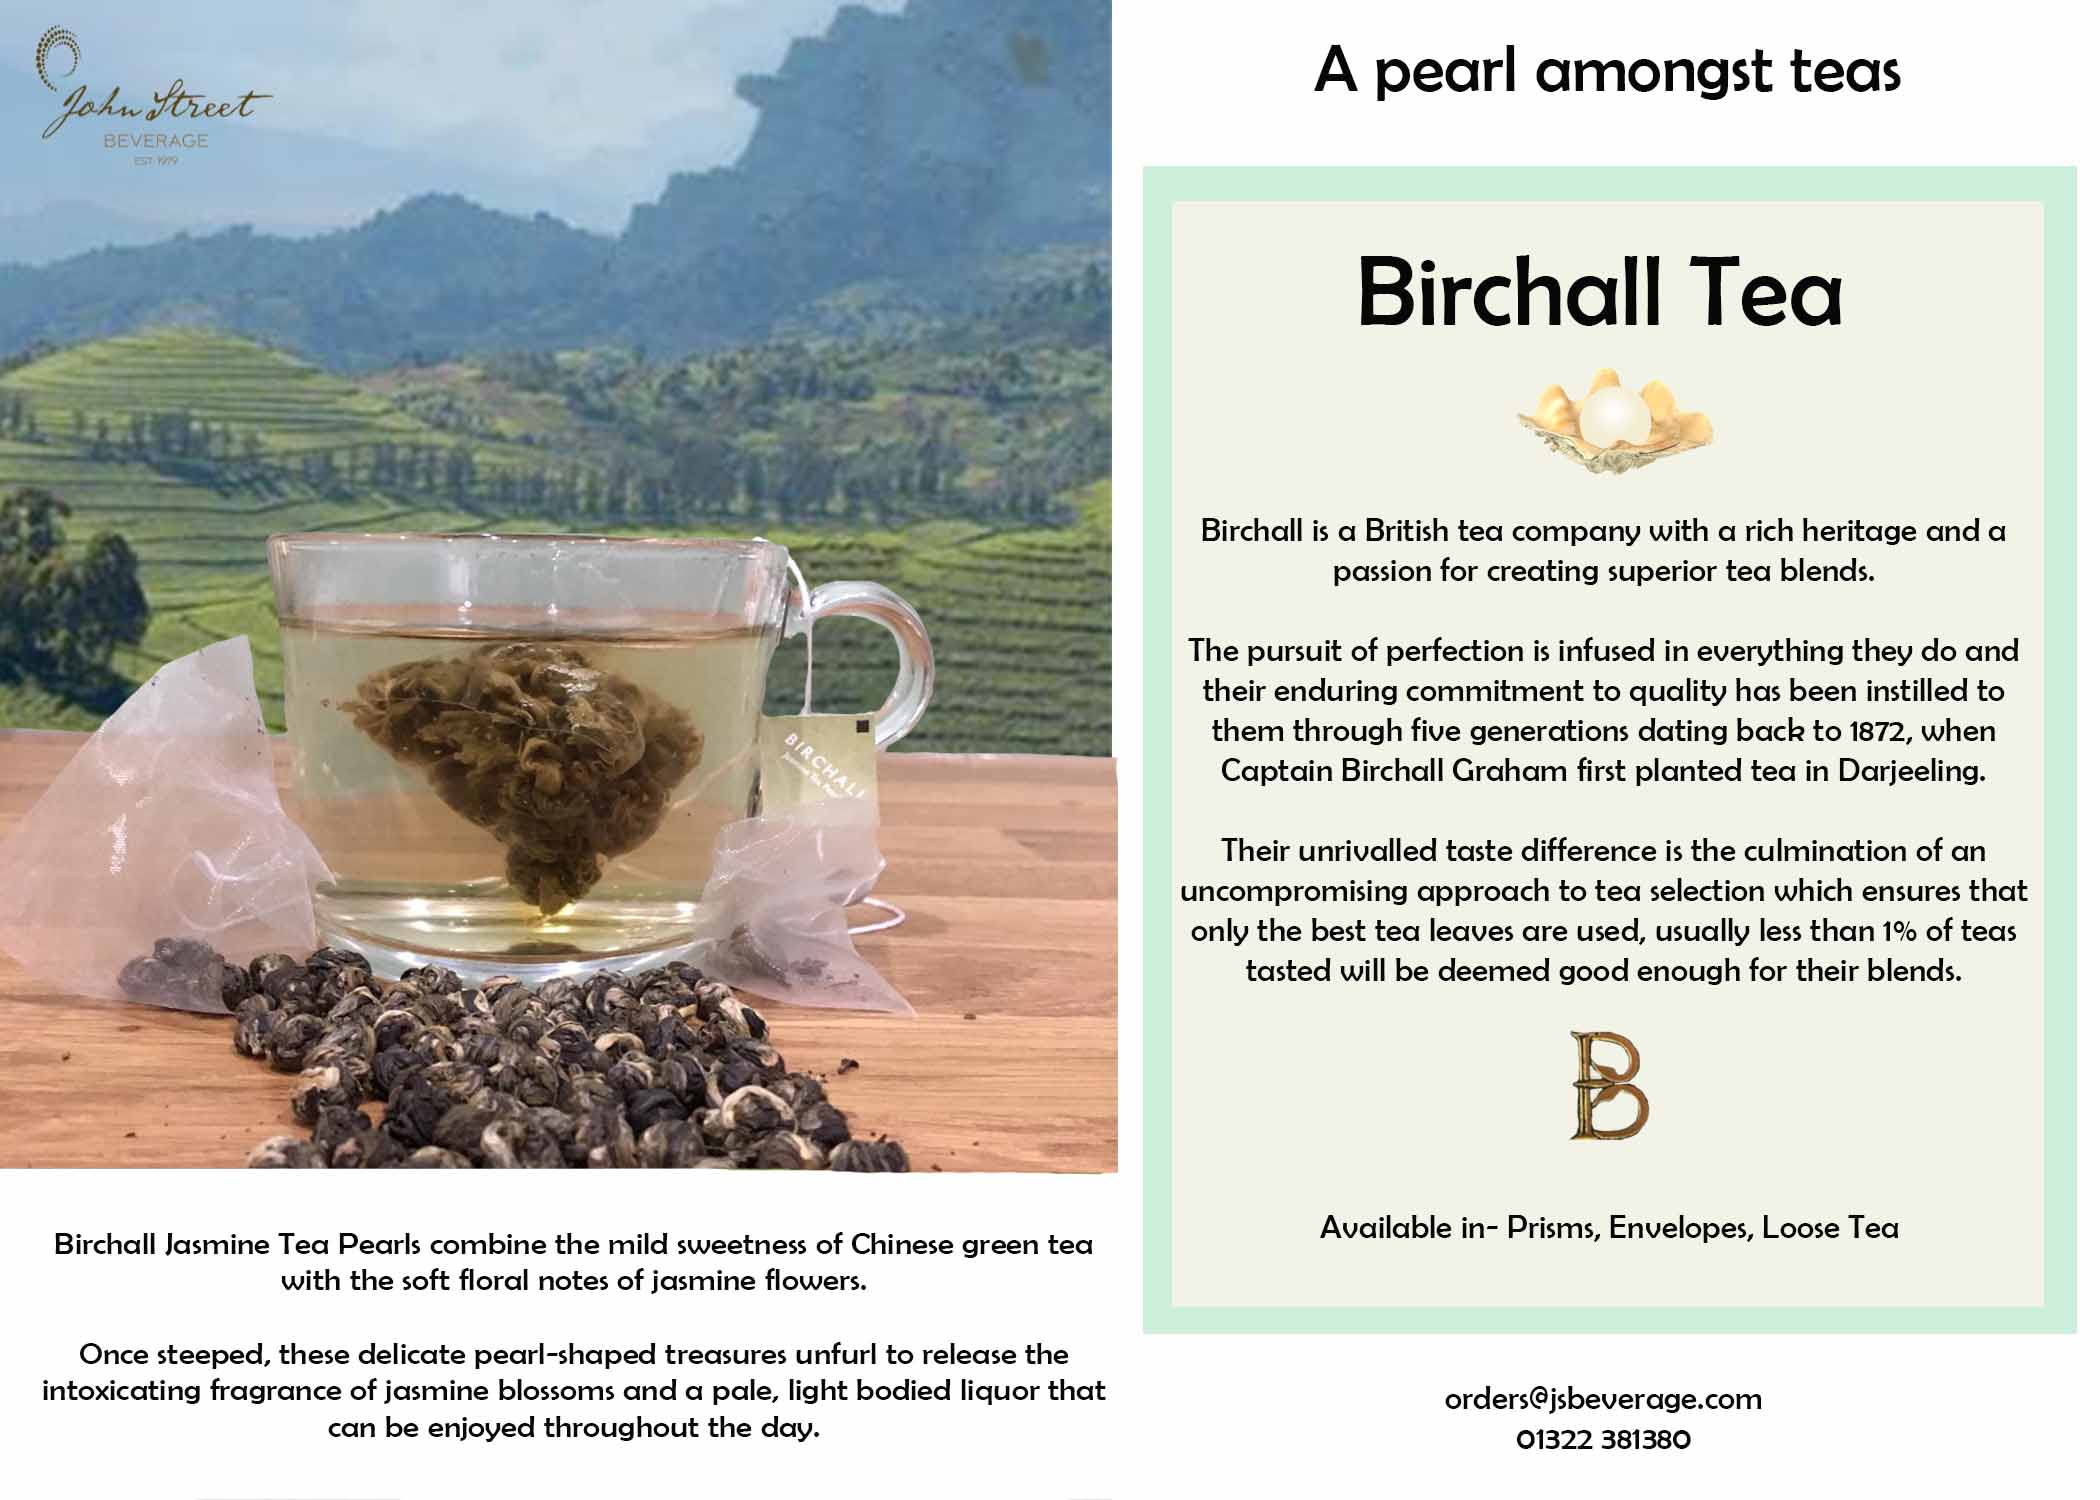 Birchall Jasmine Tea Pearls